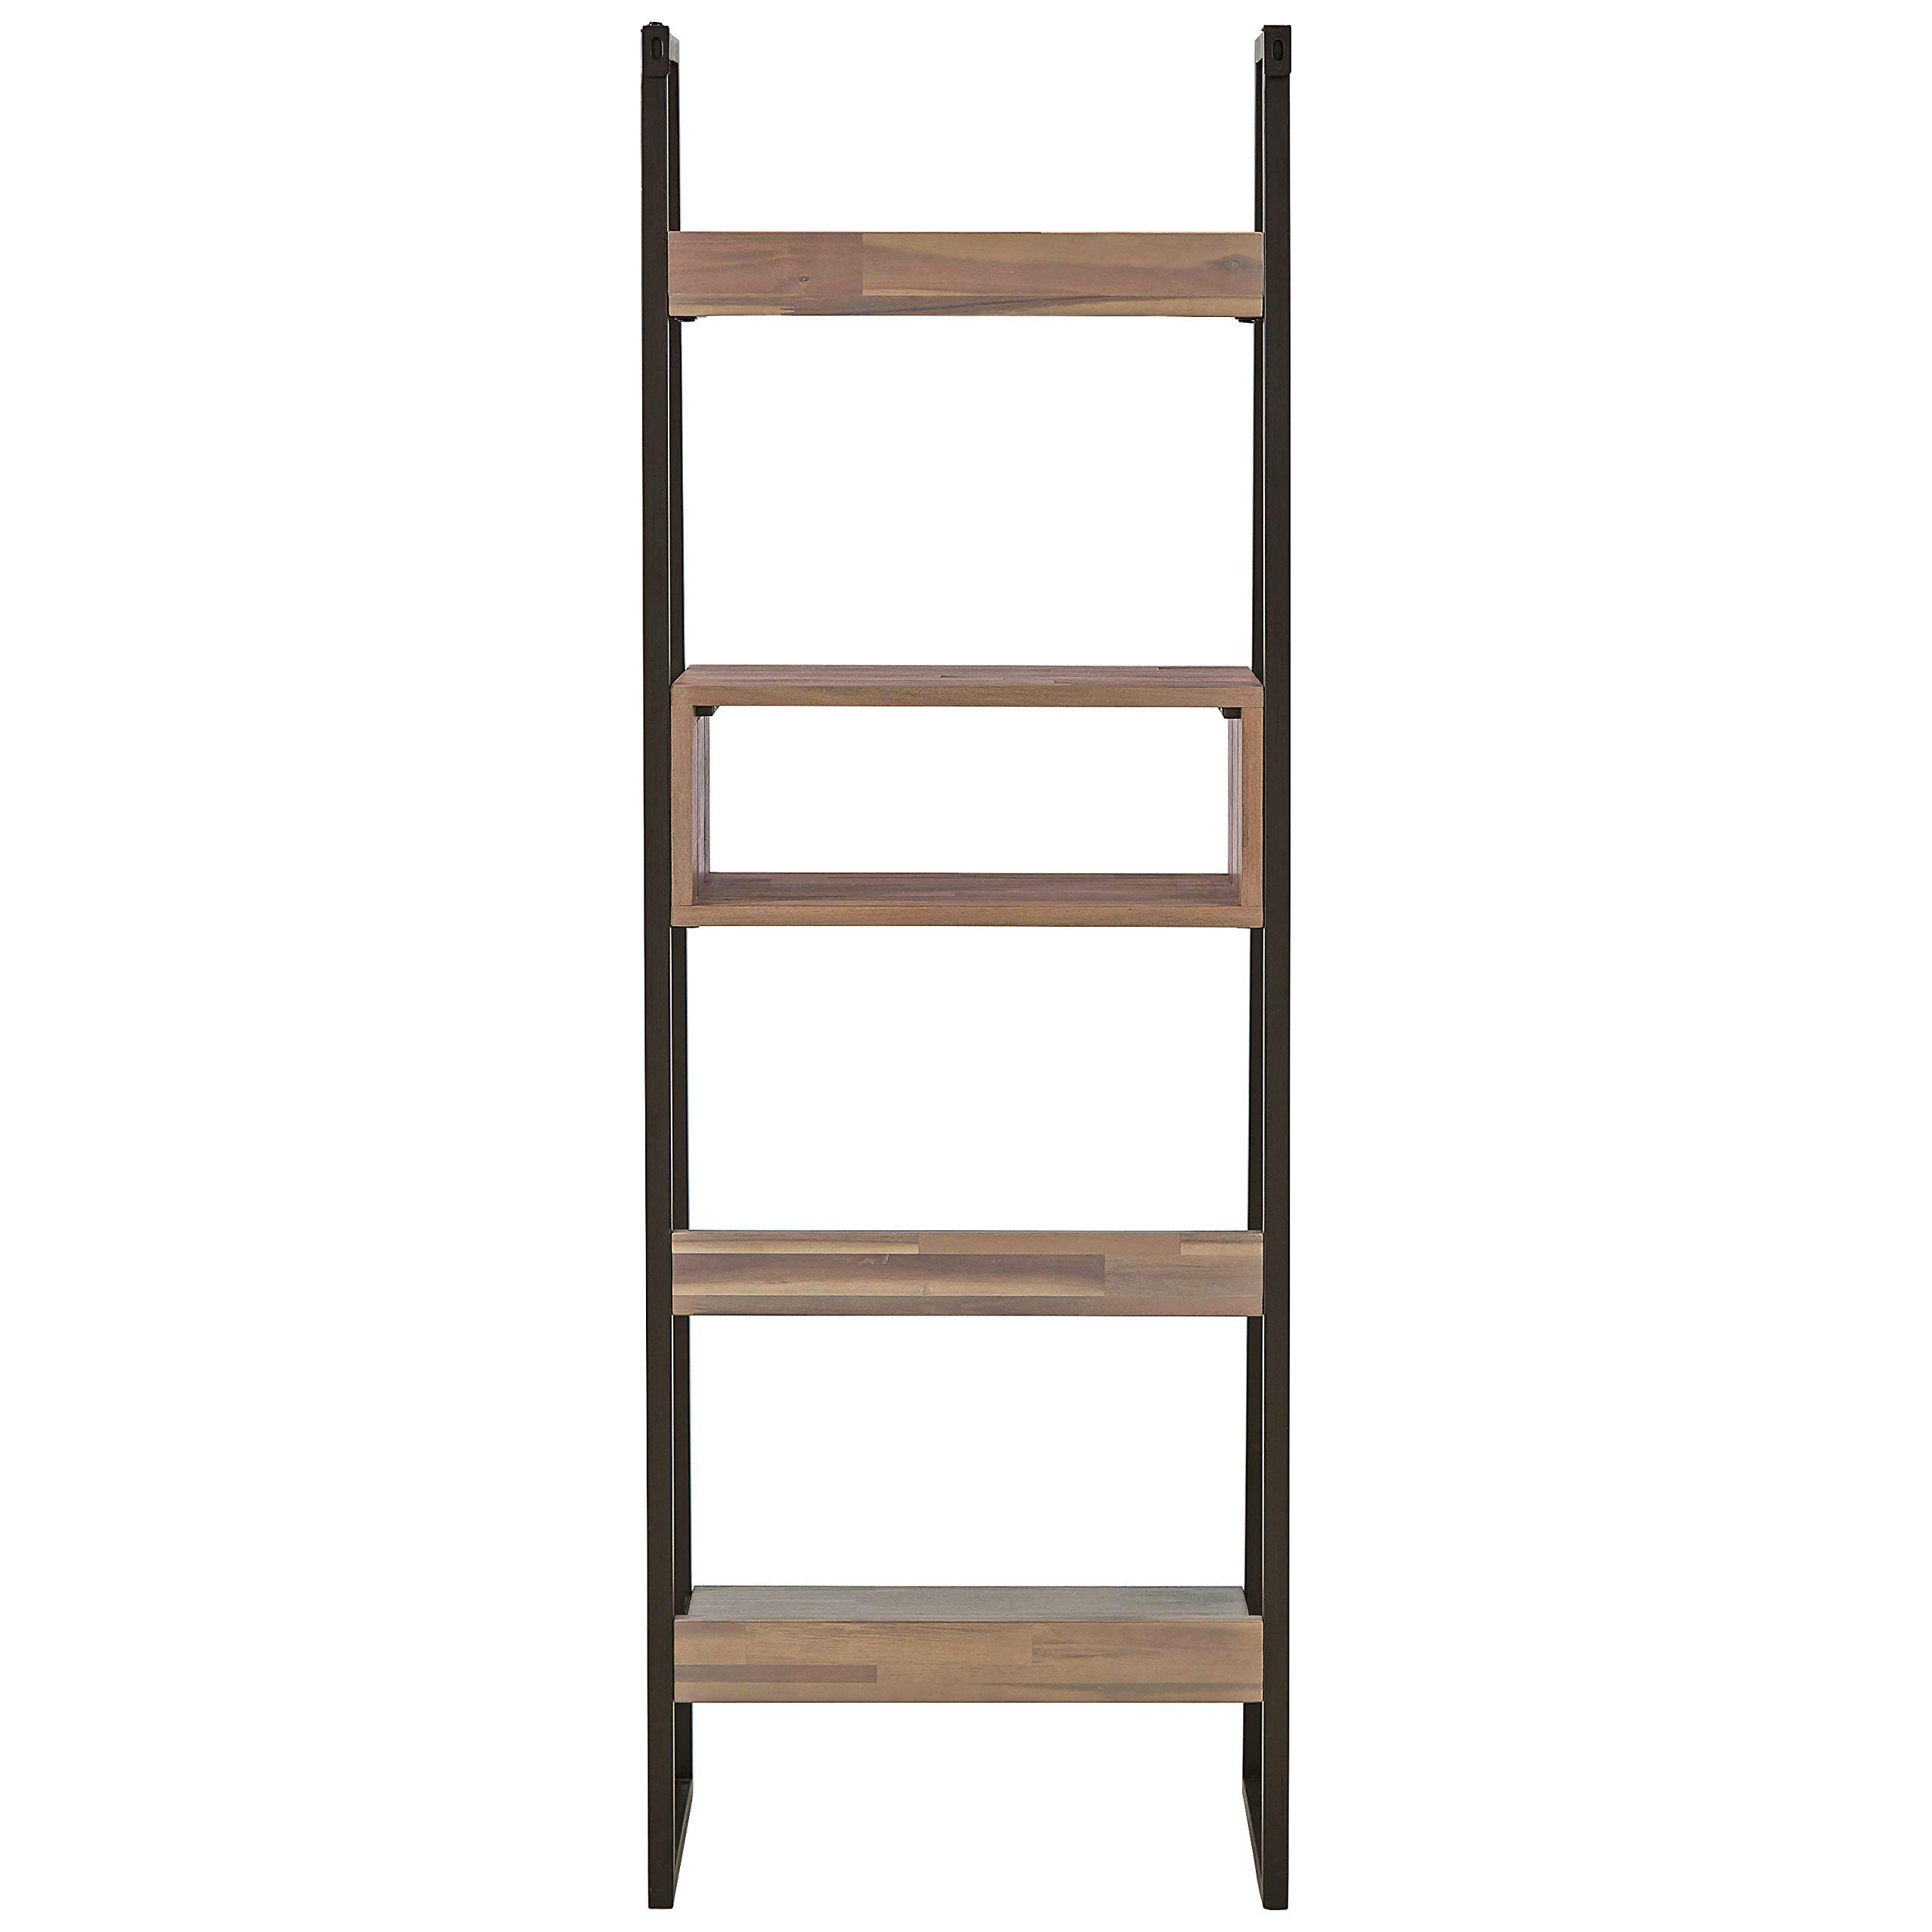 Rivet Roxmere Modern Bookcase, 23.6''W, Acacia, Sandblast Gray by Rivet (Image #4)